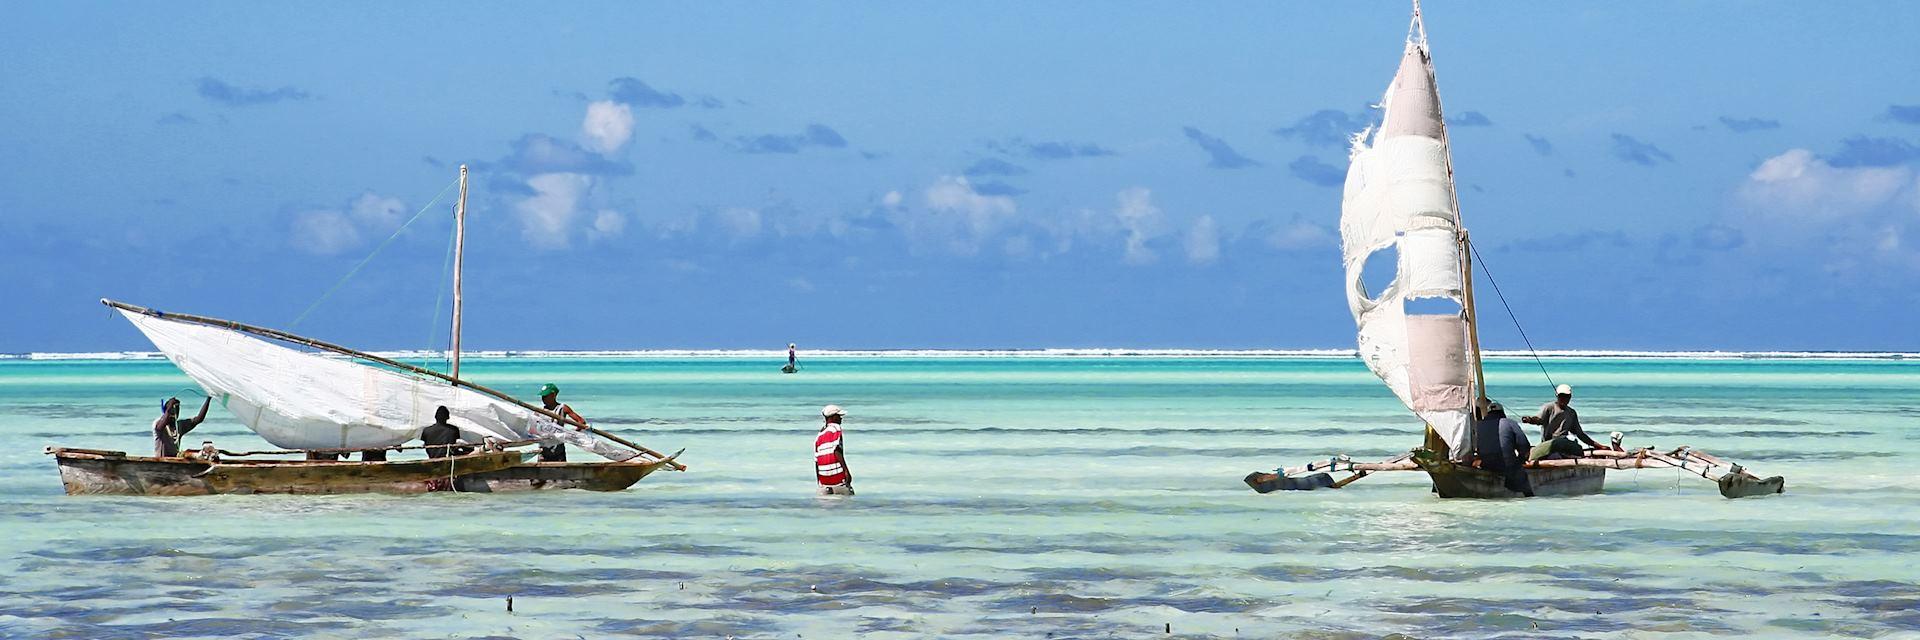 Fishing dhows in Zanzibar